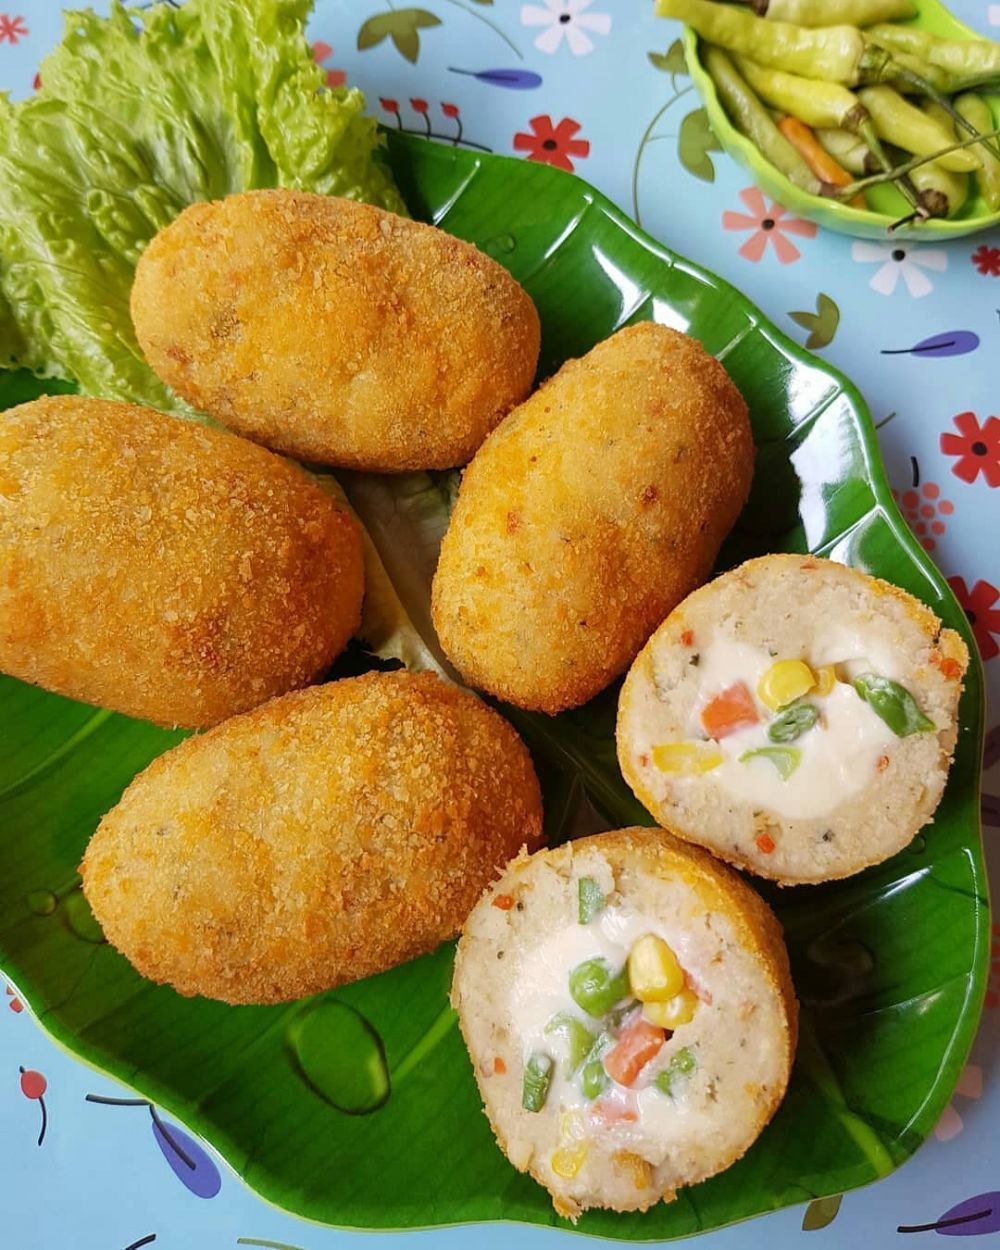 Resep Camilan Kentang Istimewa Resep Makanan Pendamping Makanan Ringan Sehat